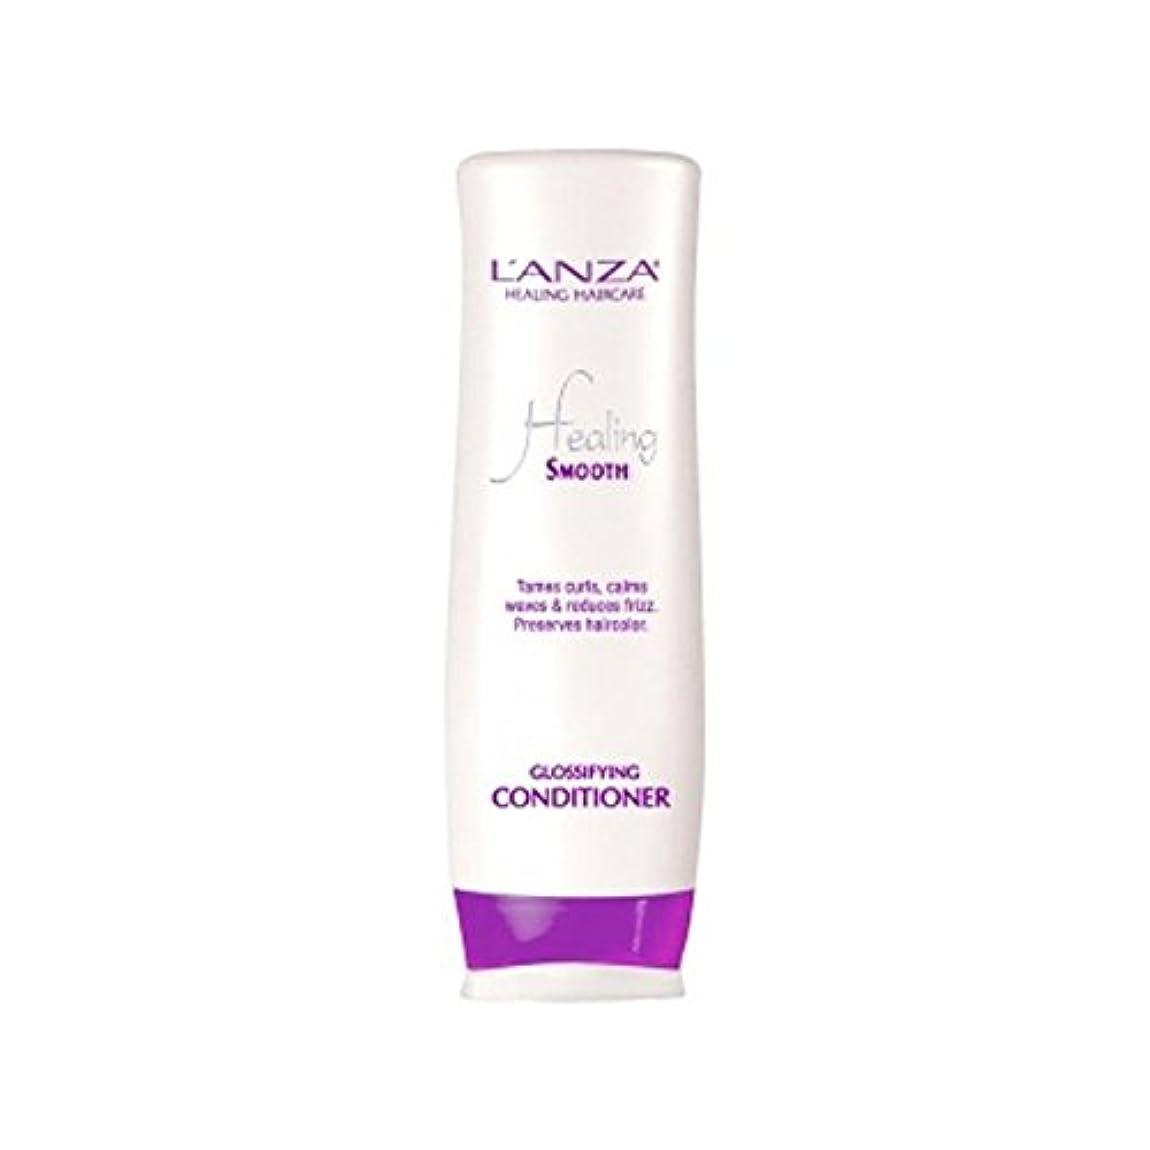 L'Anza Healing Smooth Glossifying Conditioner (250ml) - スムーズなコンディショナーを癒し'アンザ(250ミリリットル) [並行輸入品]